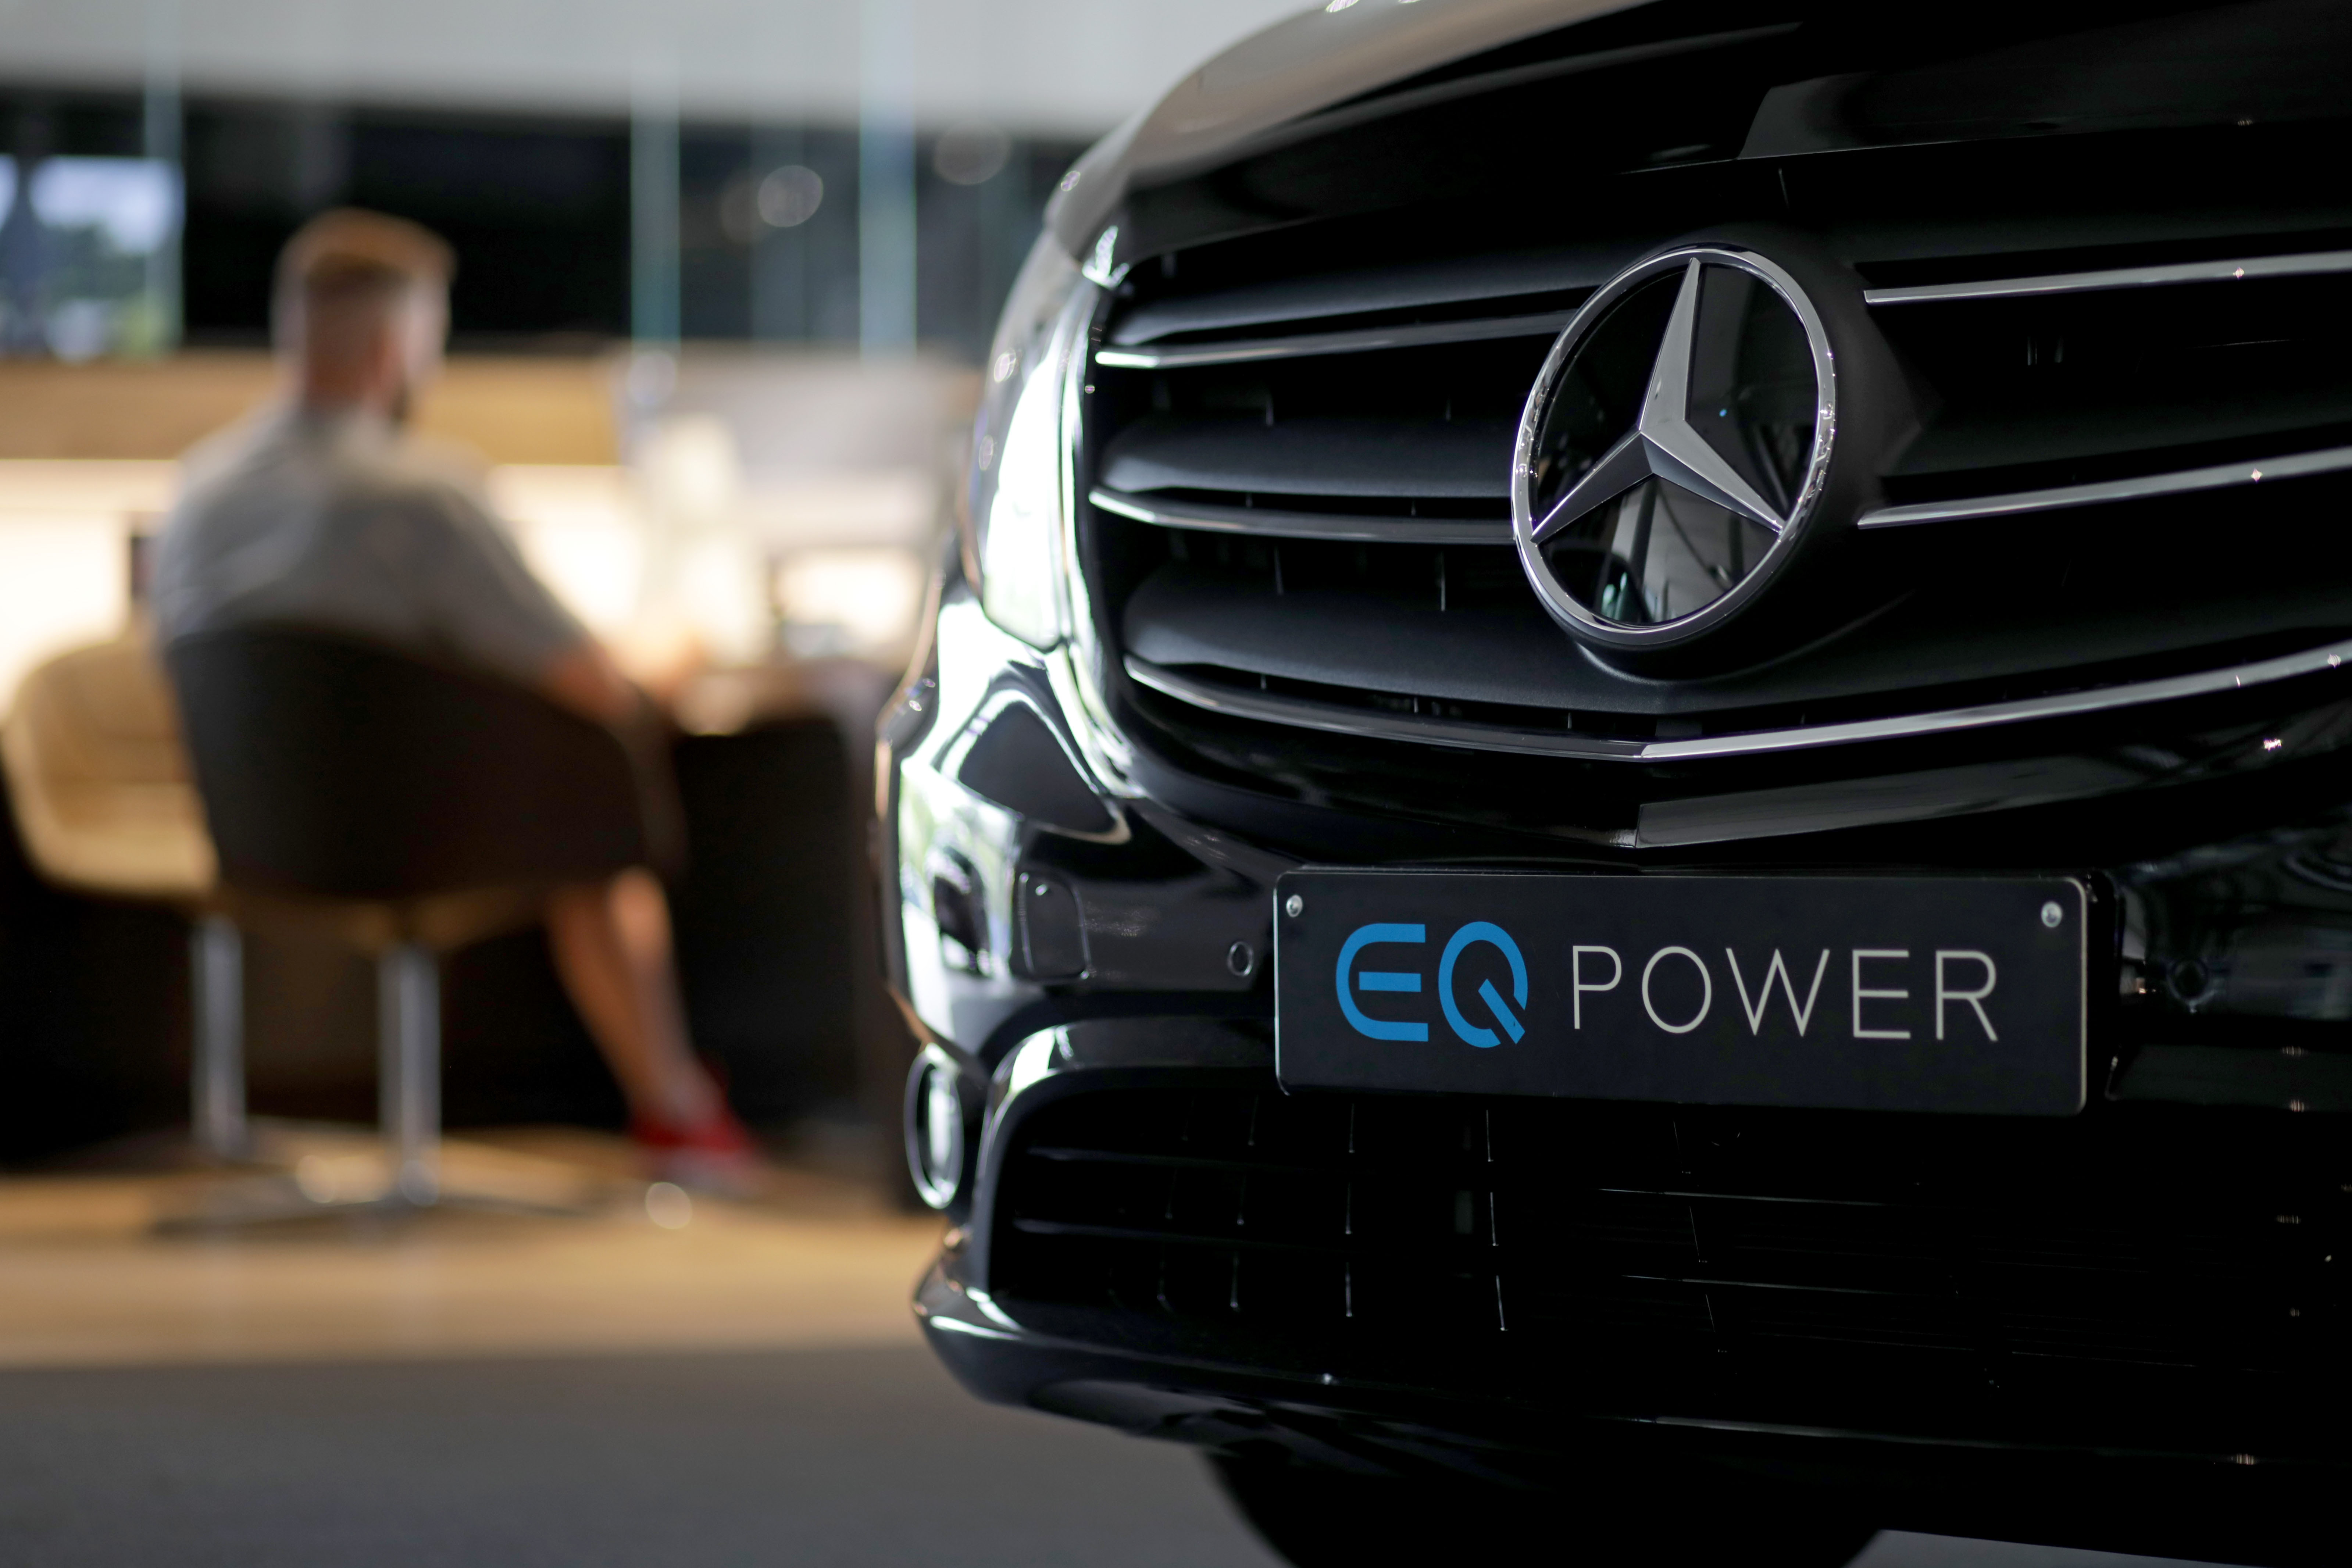 Mercedes-Benz AG Auto Showroom Ahead of Earnings